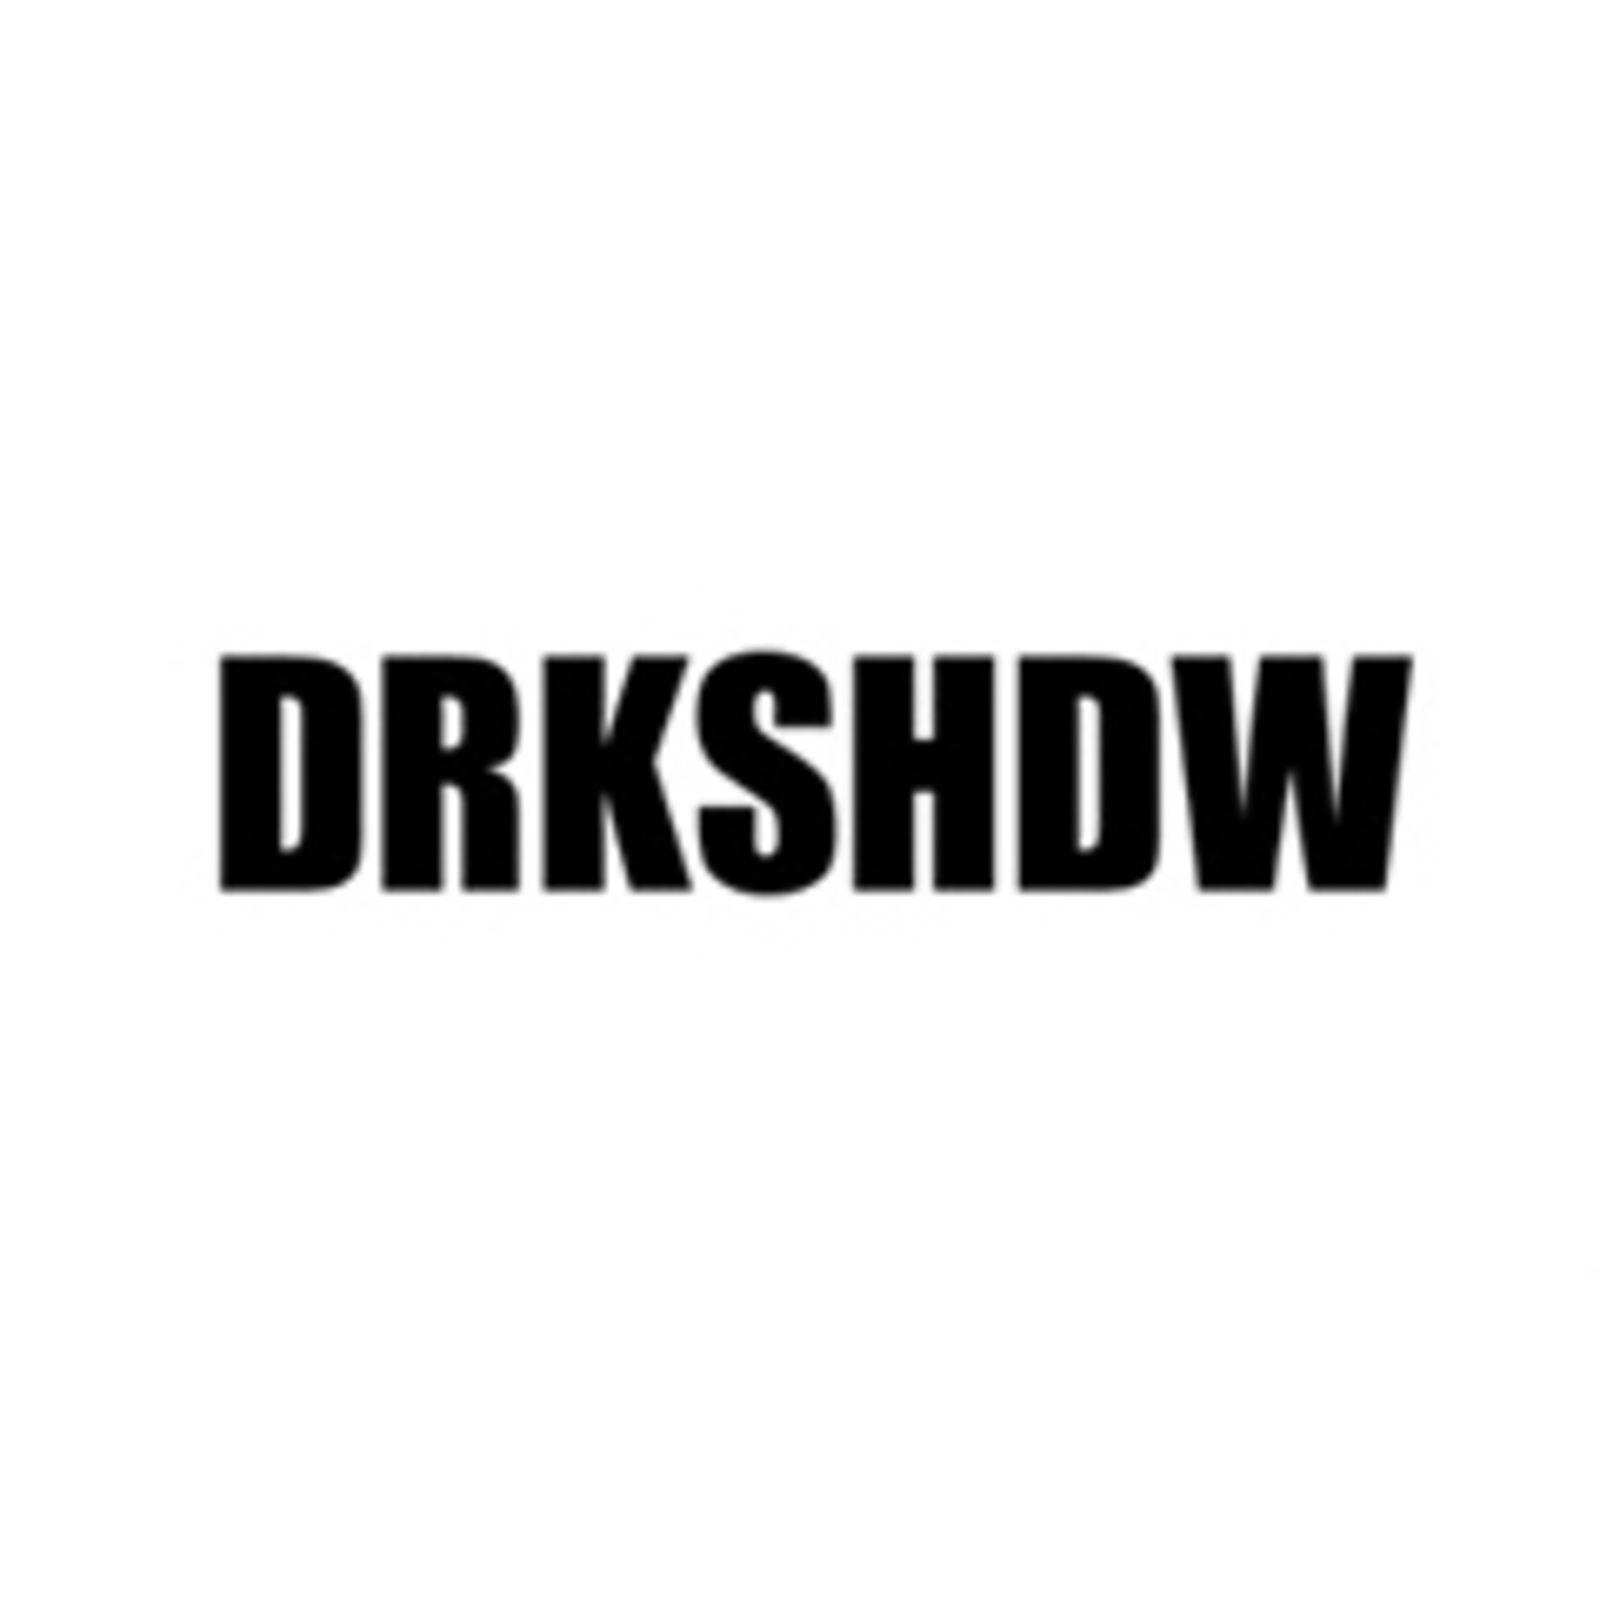 DRKSHDW (Image 1)